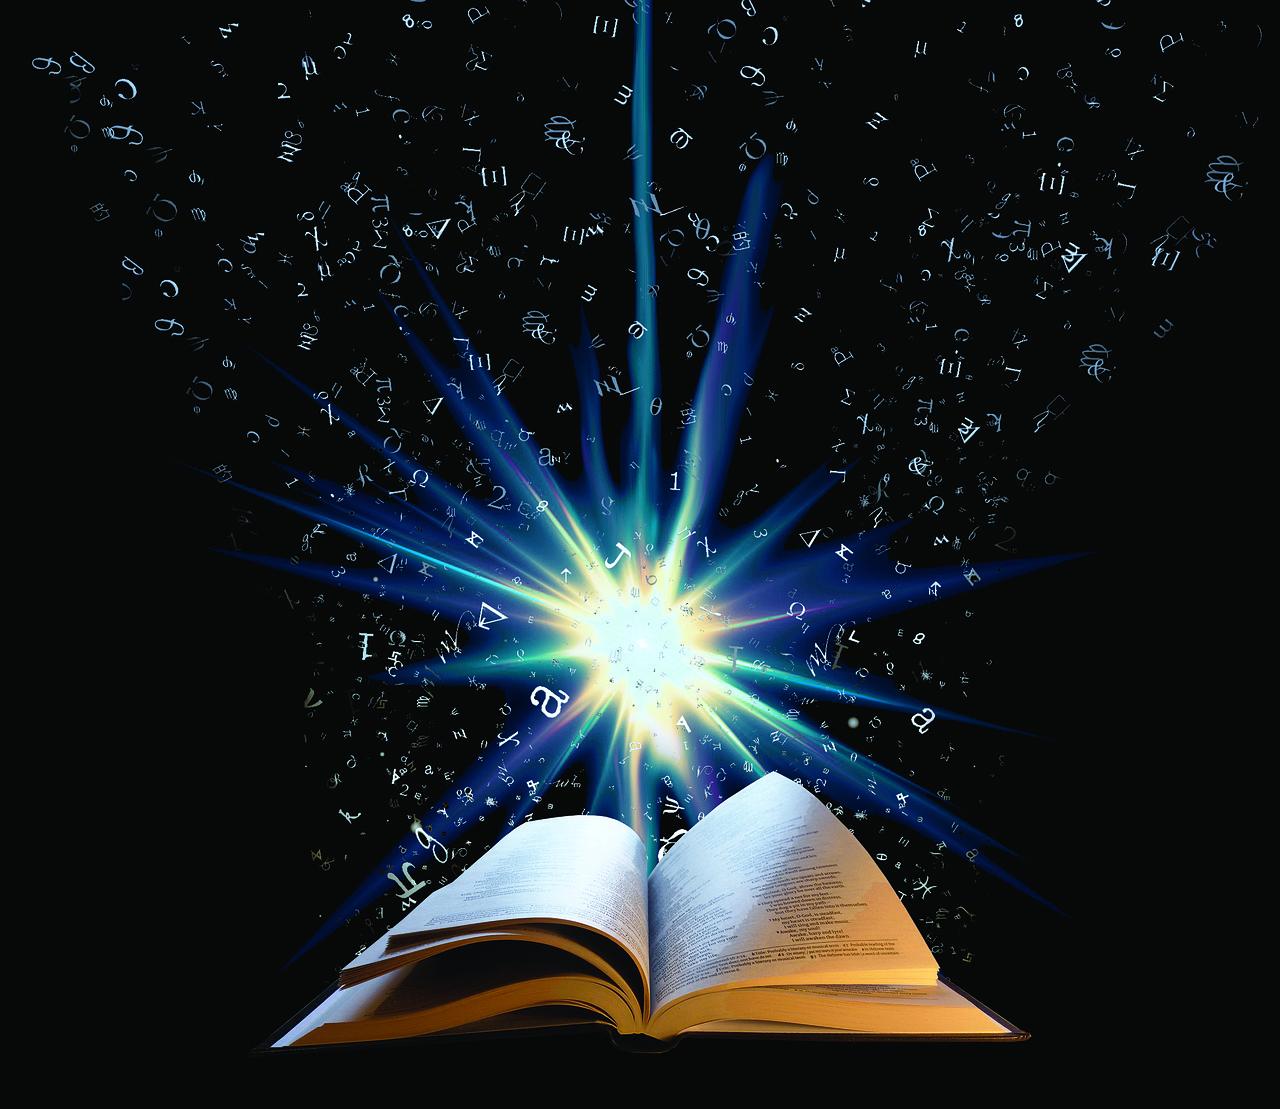 bible-2989425_1280